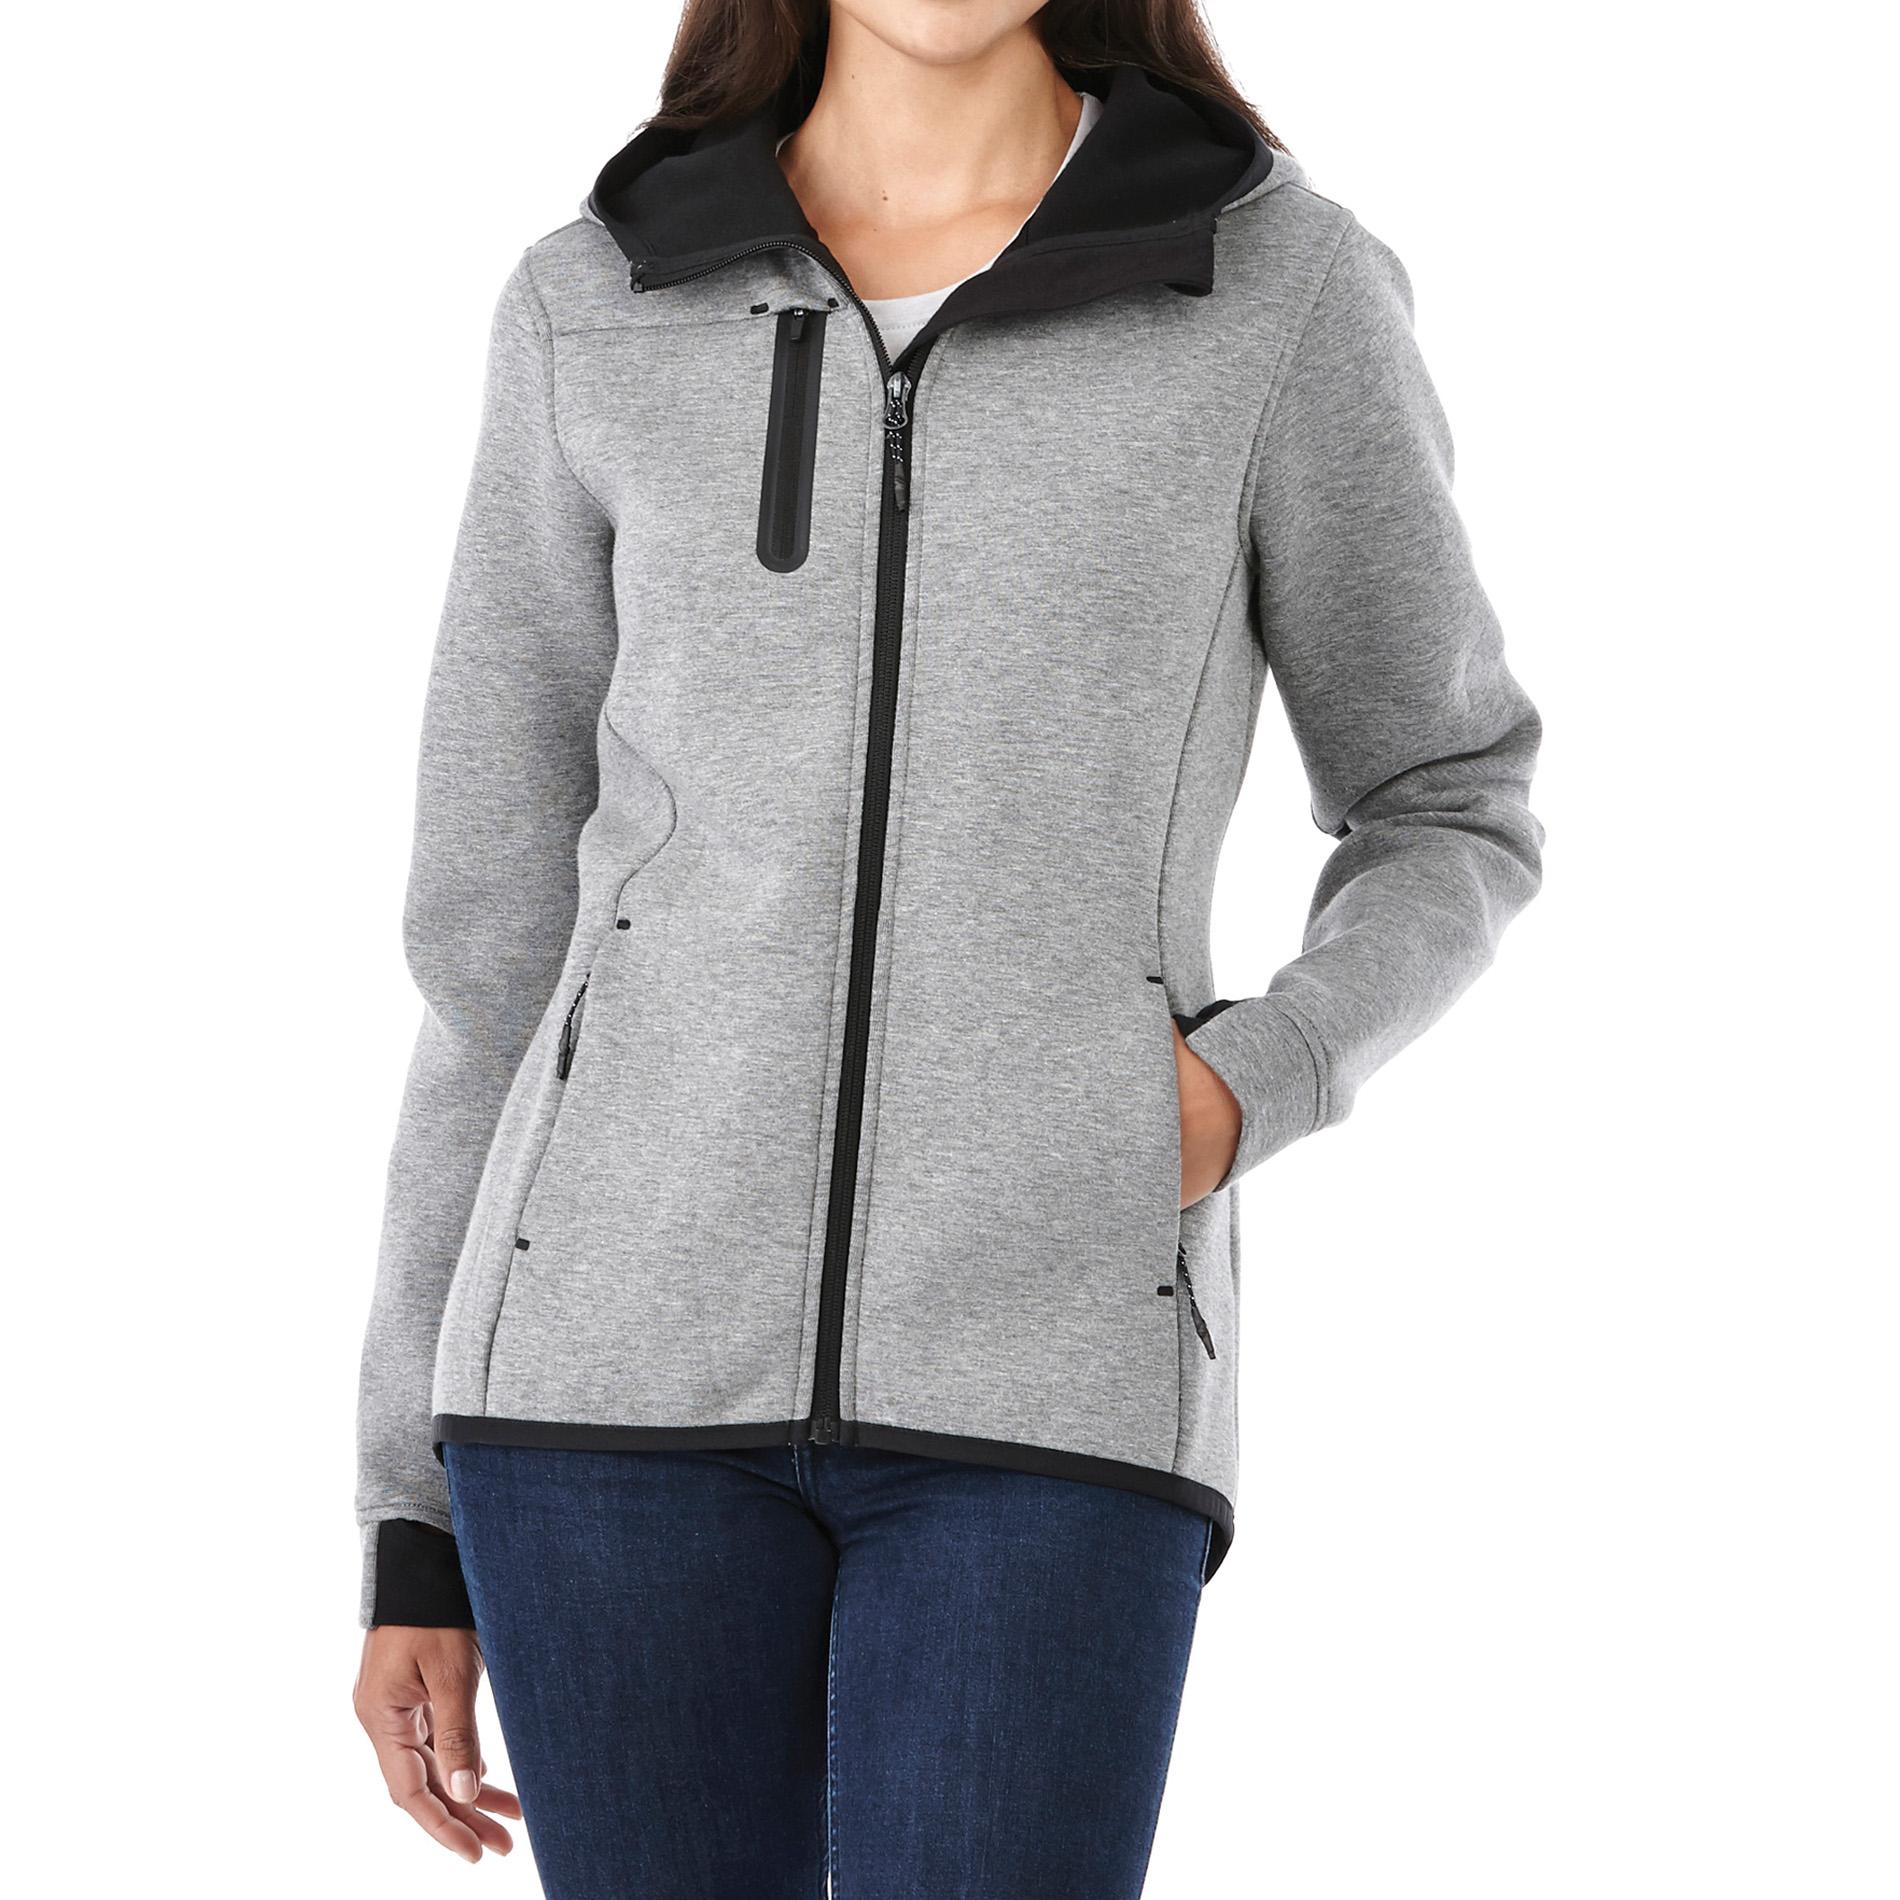 Elevate TM98133 - Women's CHIVERO Knit Jacket